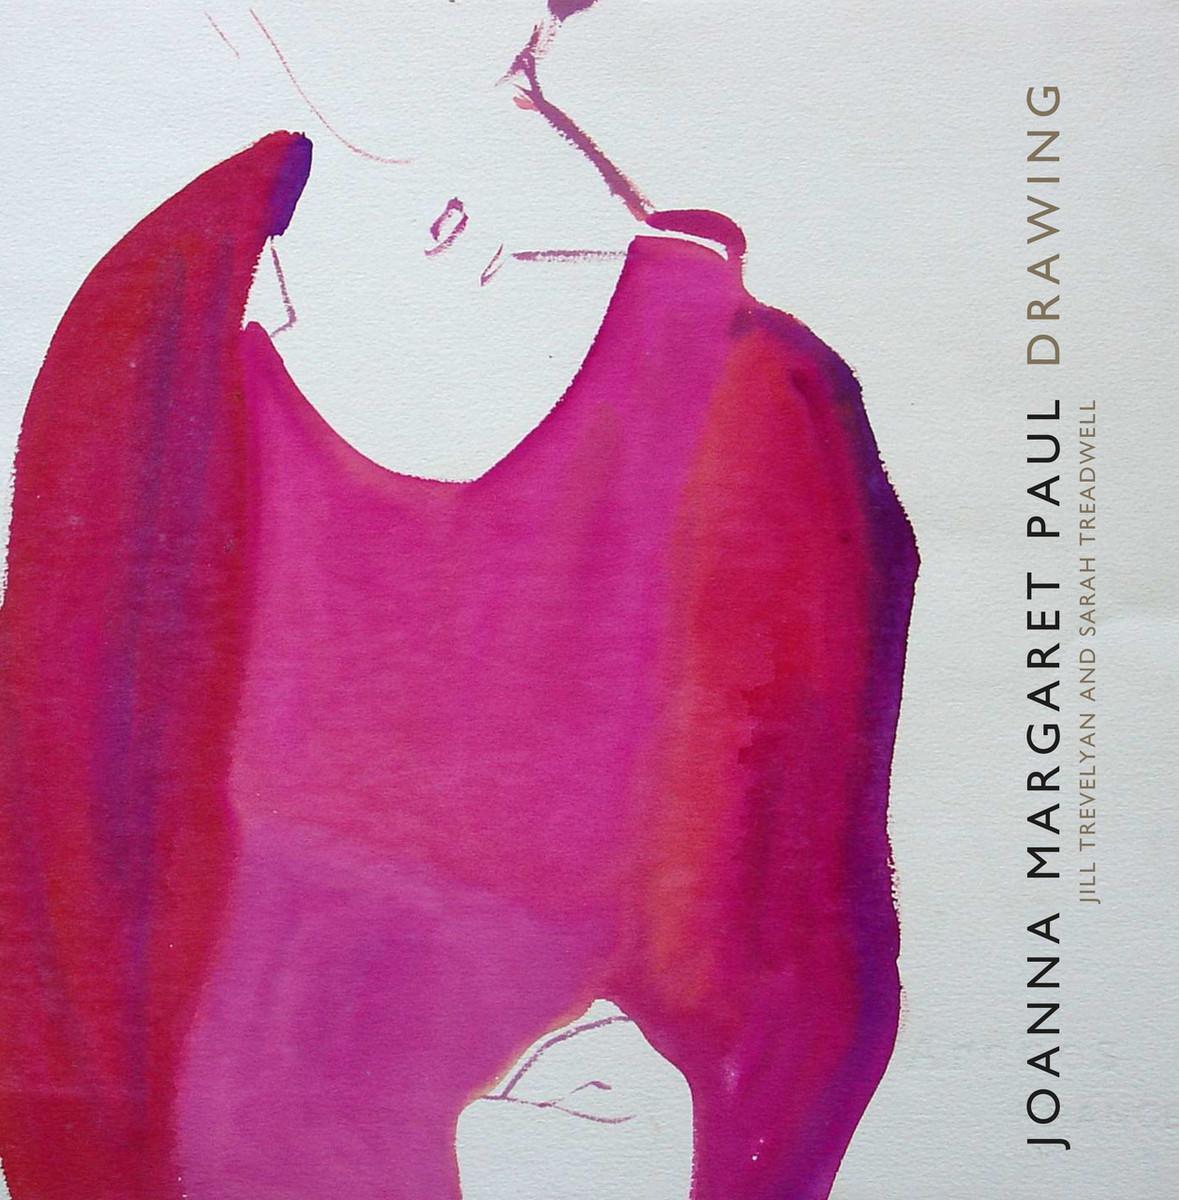 Joanna Margaret Paul: Drawing by Jill Trevelyan & Sarah Treadwell